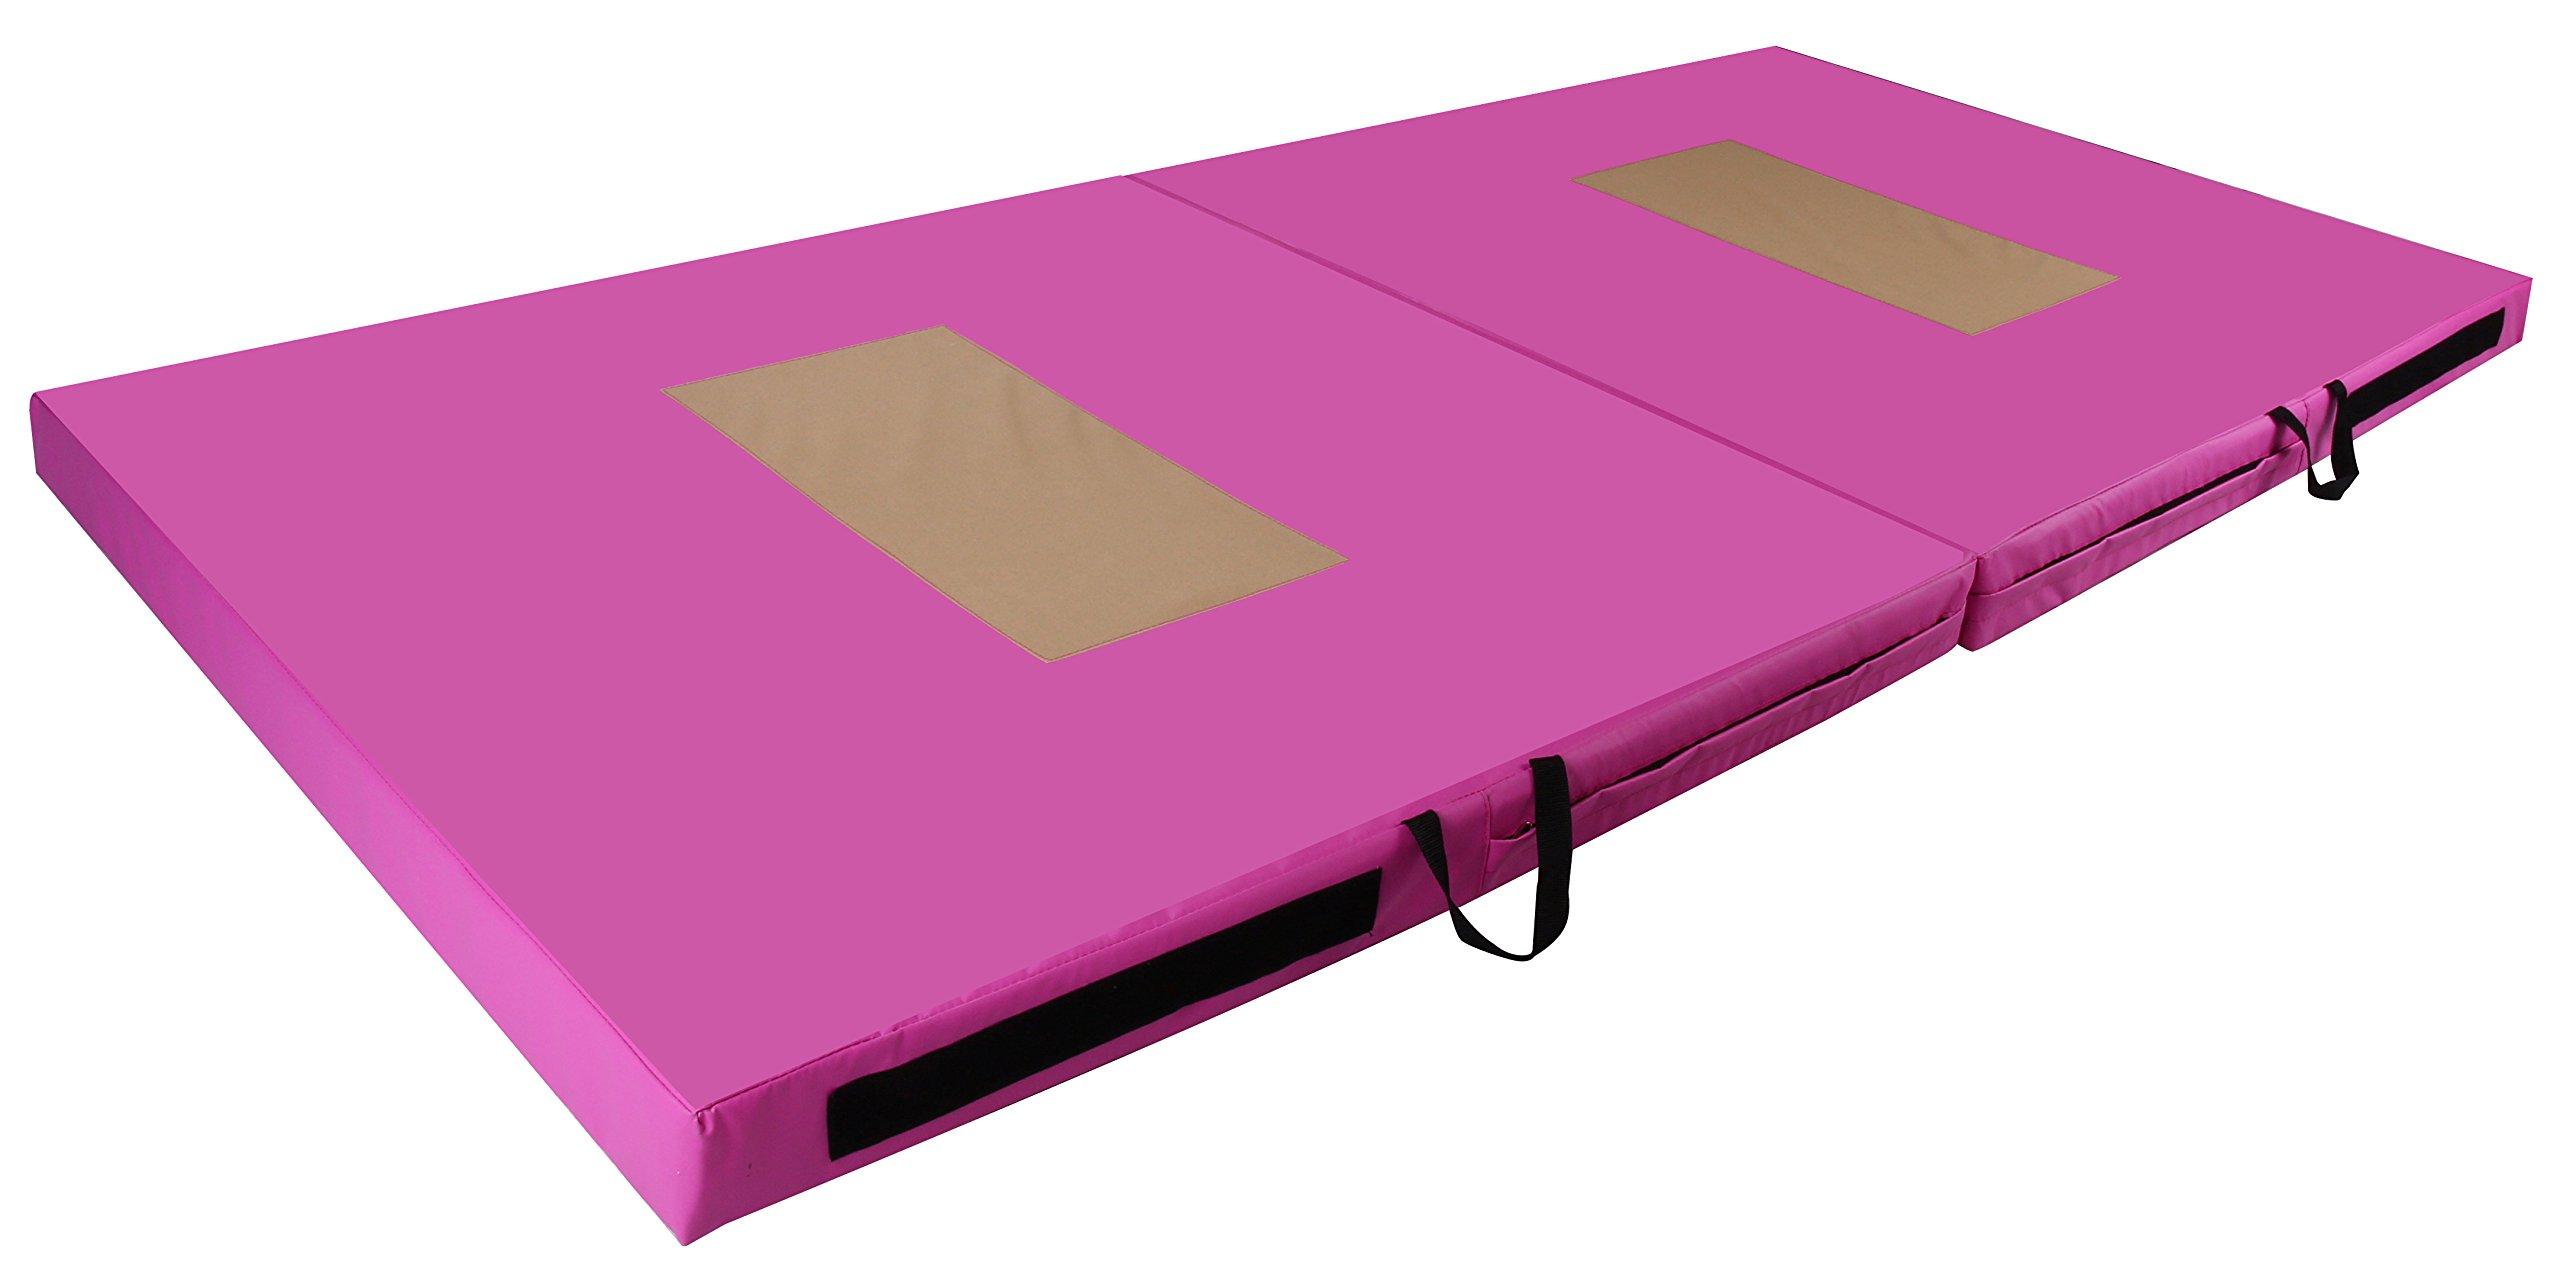 BalanceFrom GoGym All-Purpose 4'x8'x4 Extra Thick High Density Anti-Tear Gymnastics Gym Folding Exercise Aerobics Mats (Pink)